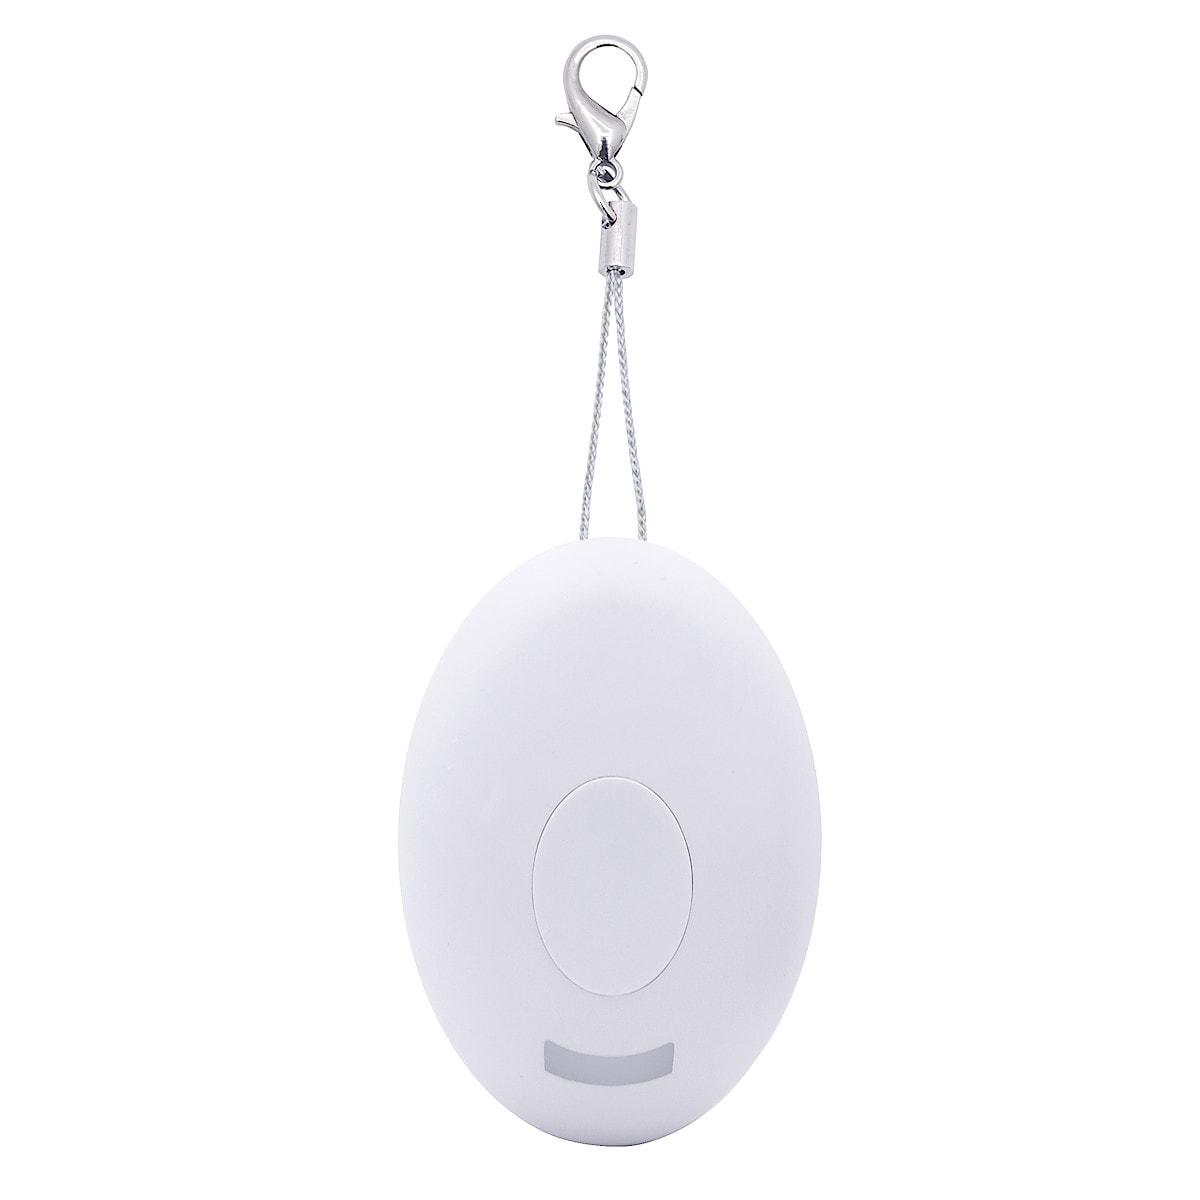 Nexa MKFT-1704 Mini-Remote Control